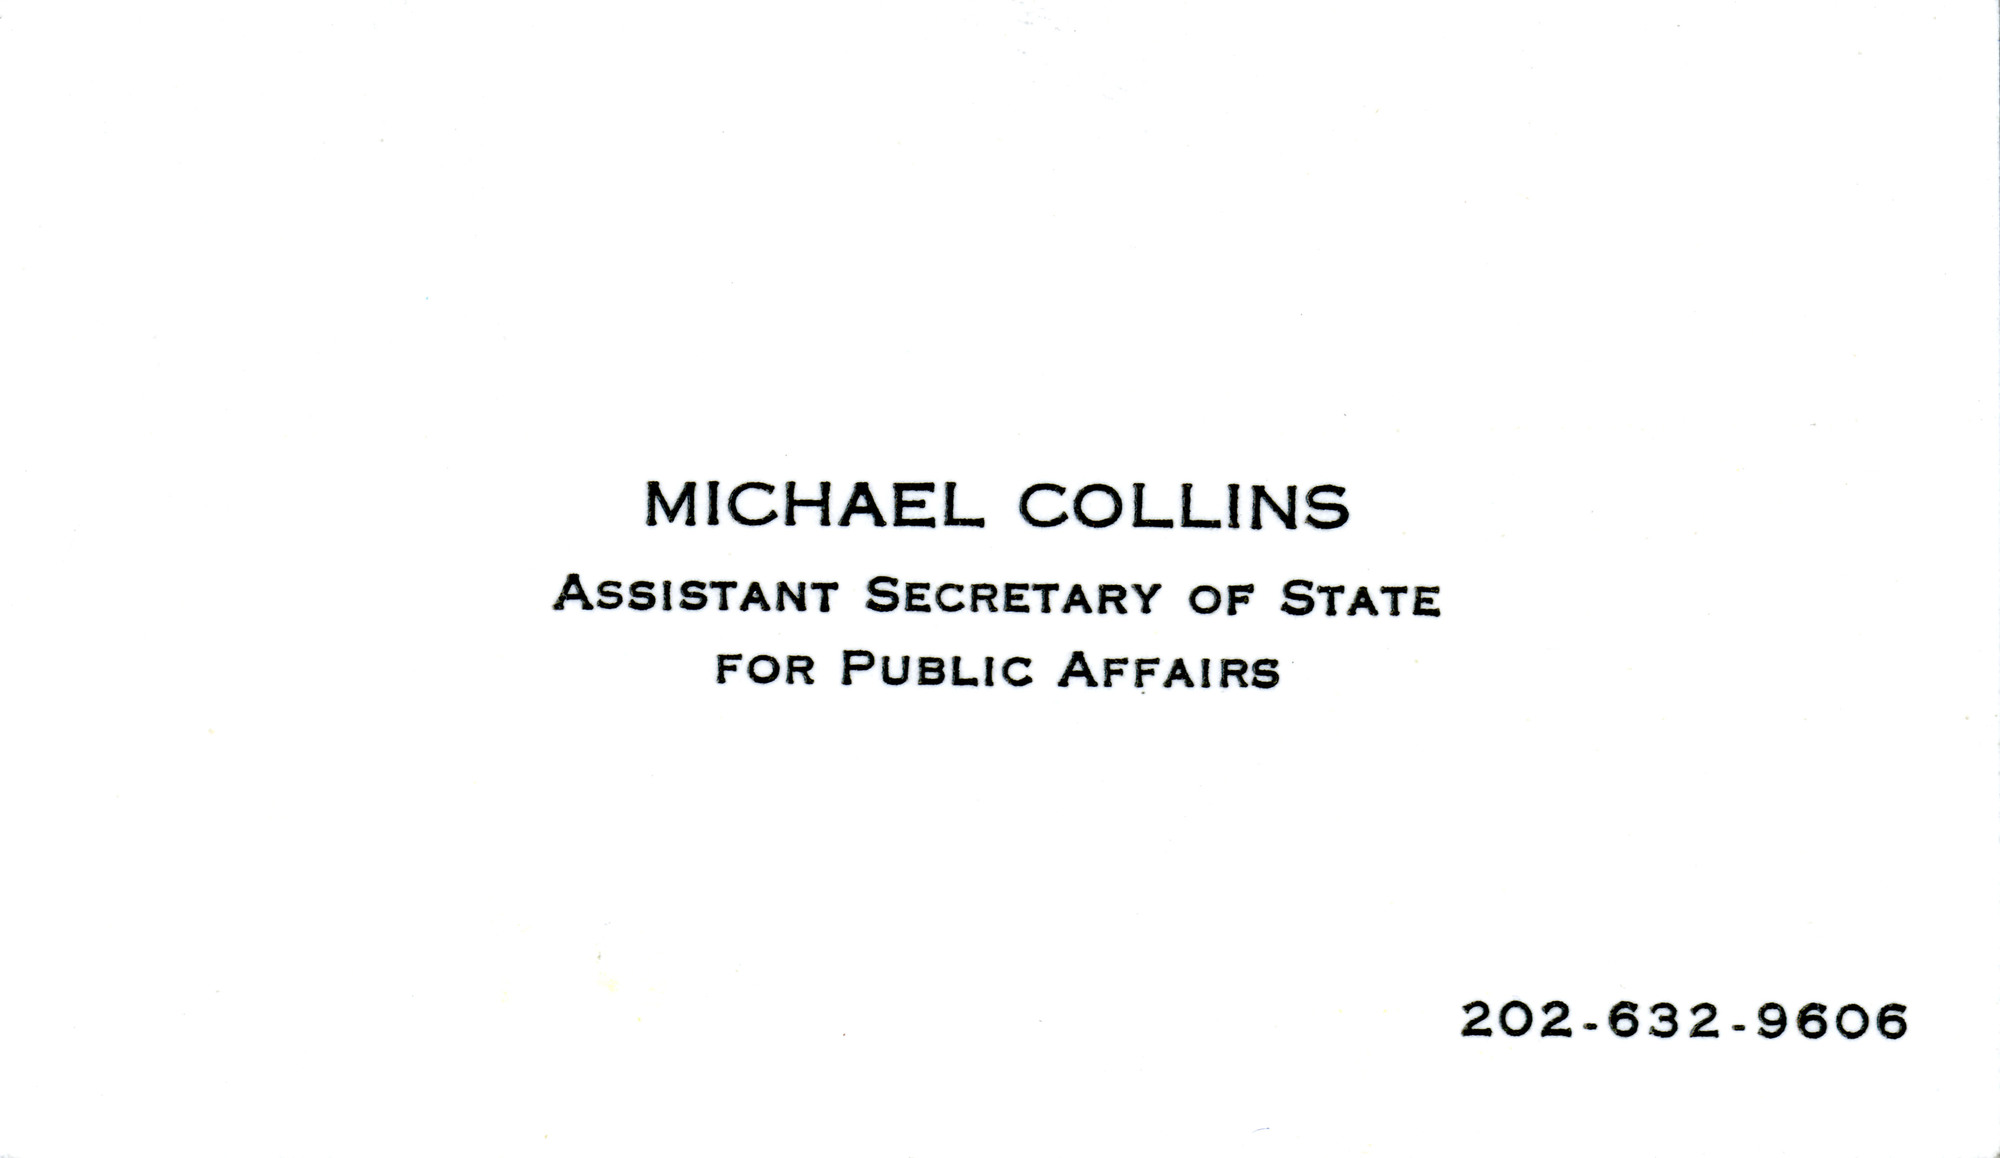 http://spec.lib.vt.edu/pickup/Omeka_upload/Ms1989-029_B18_F1_MichaelCollins_BusinessCard_NDa.jpg